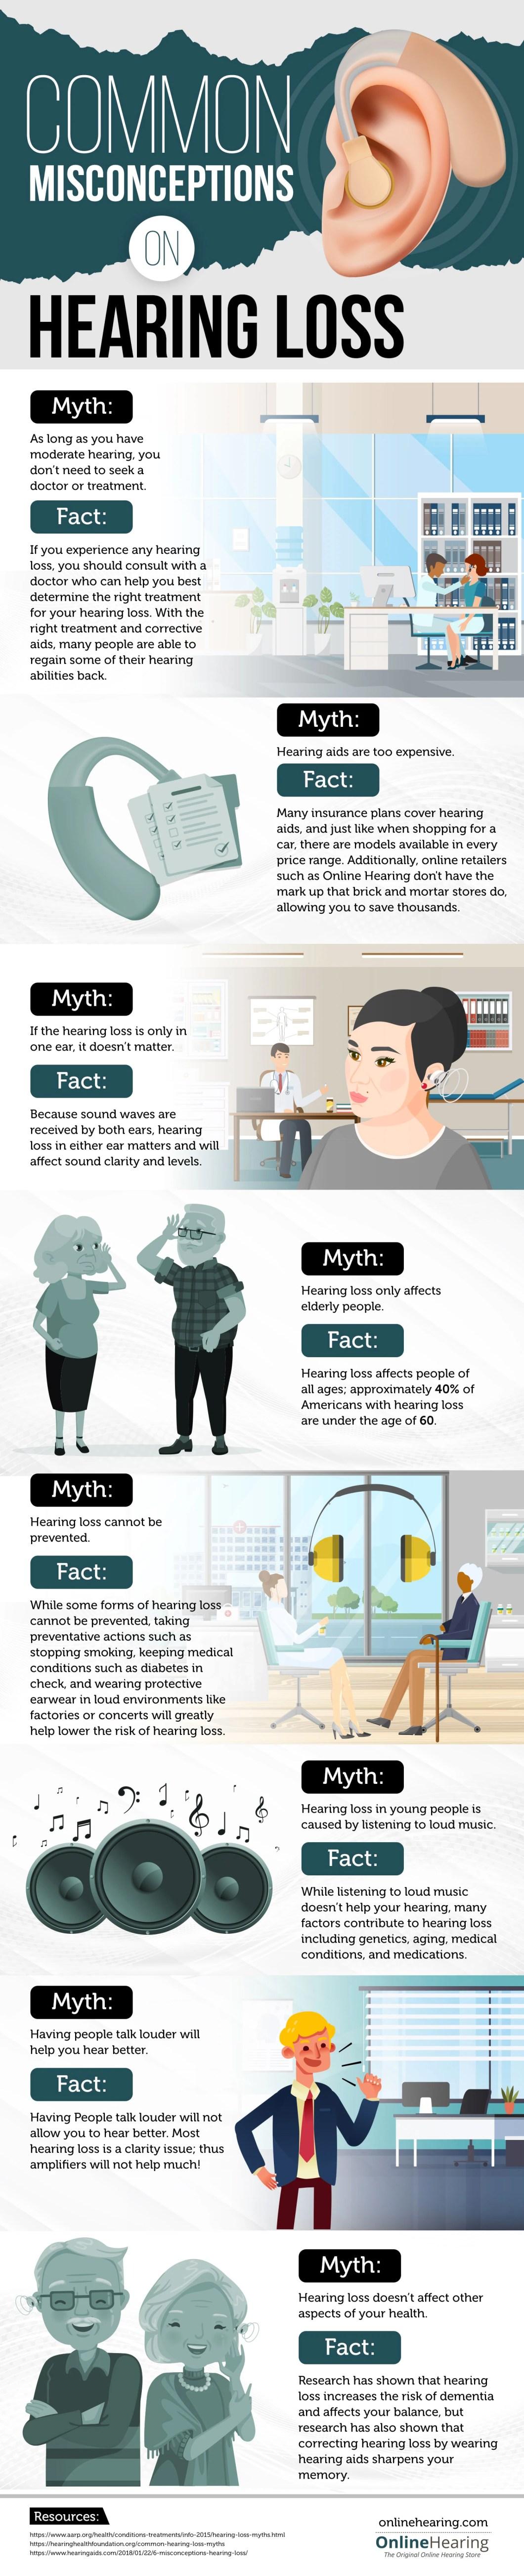 8 Common Myths Surrounding Hearing Loss!